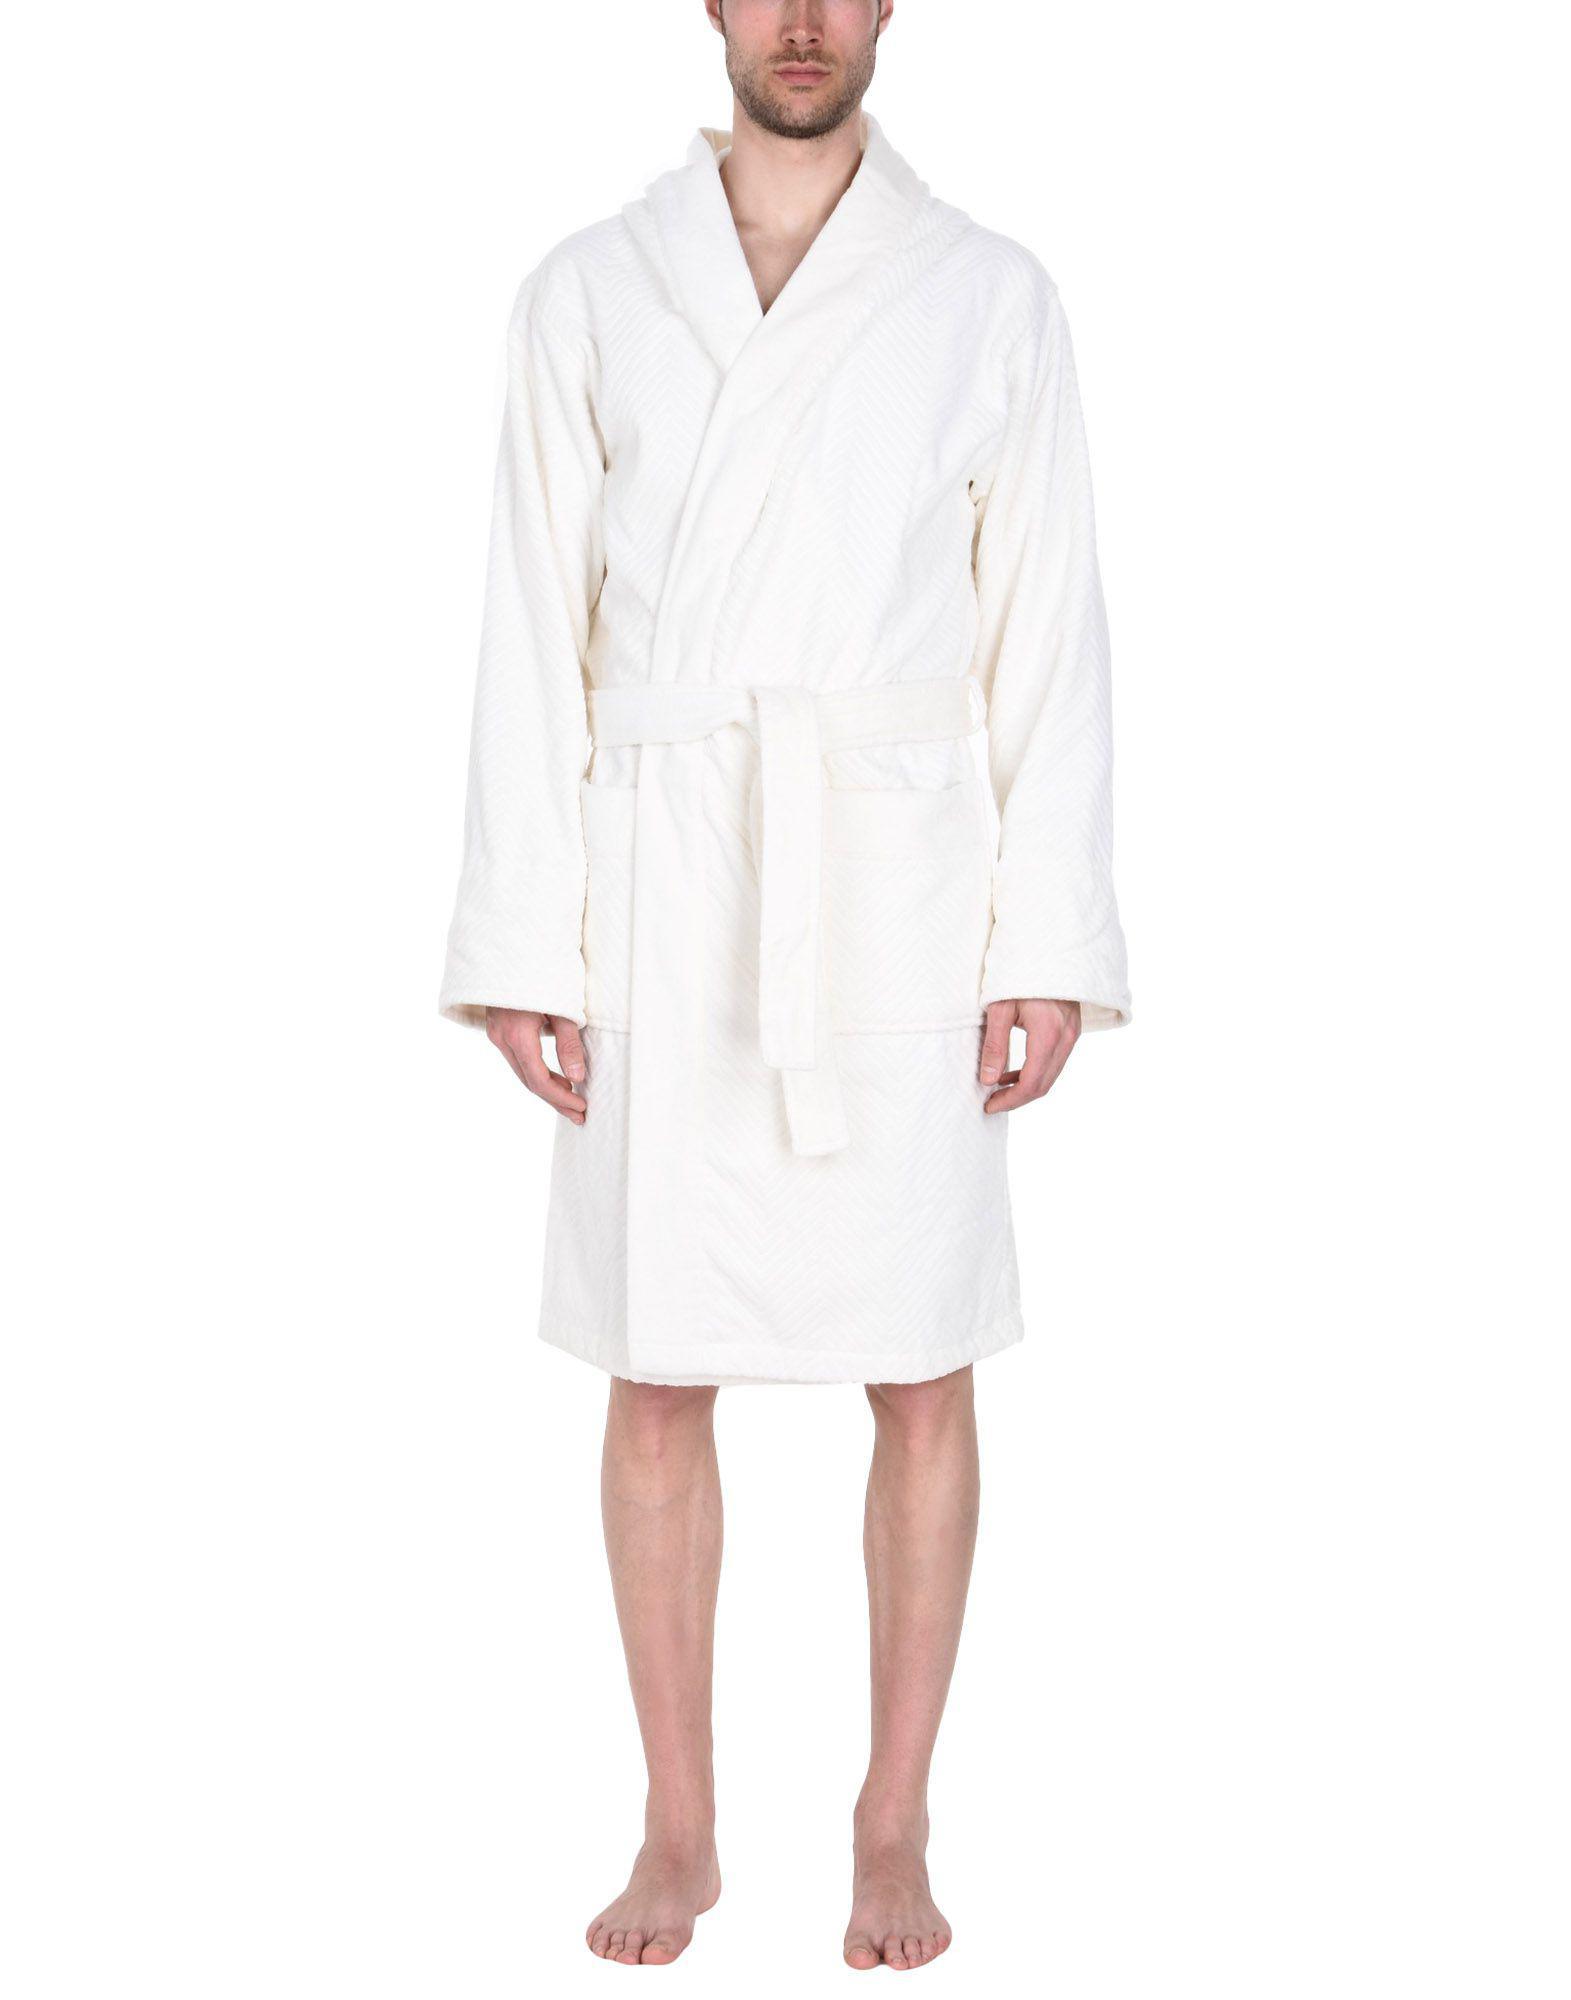 La Perla Towelling Dressing Gown in White for Men - Lyst